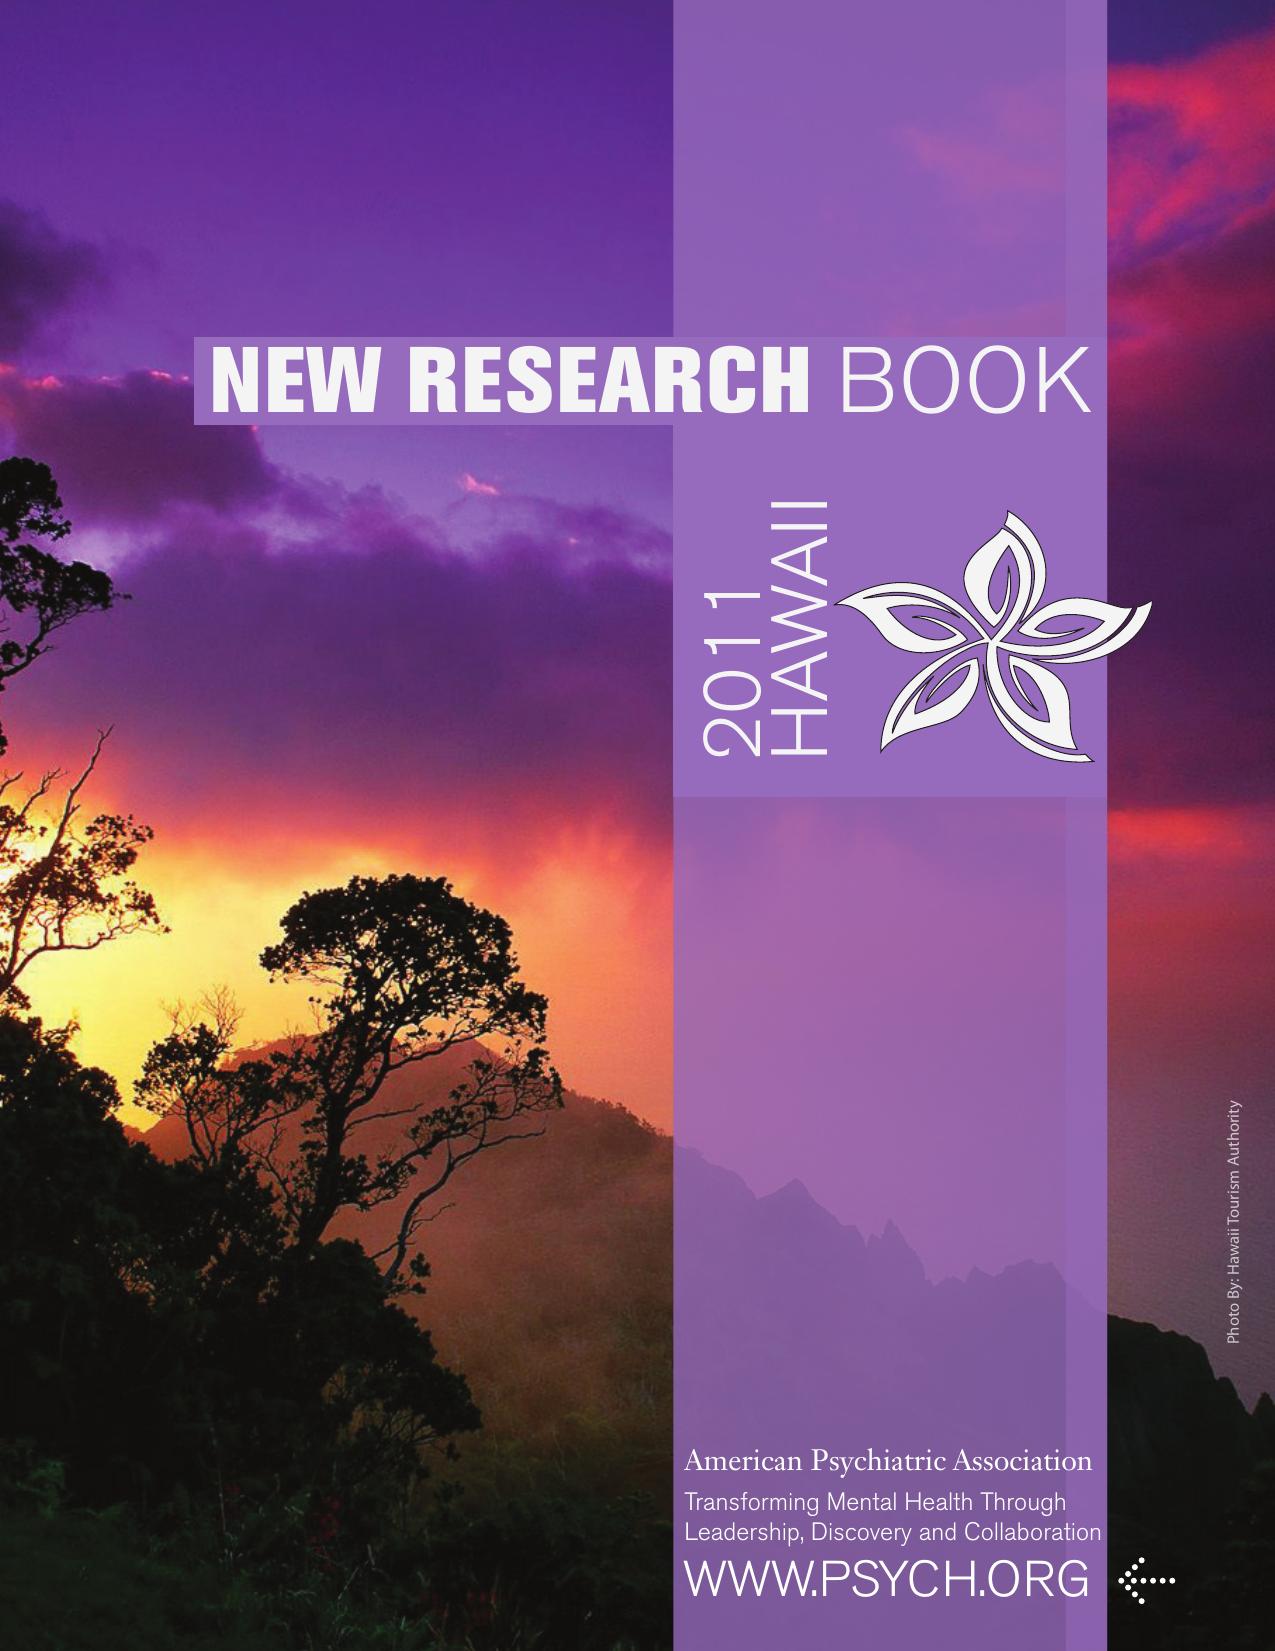 new research book - American Psychiatric Association d1c7c66657